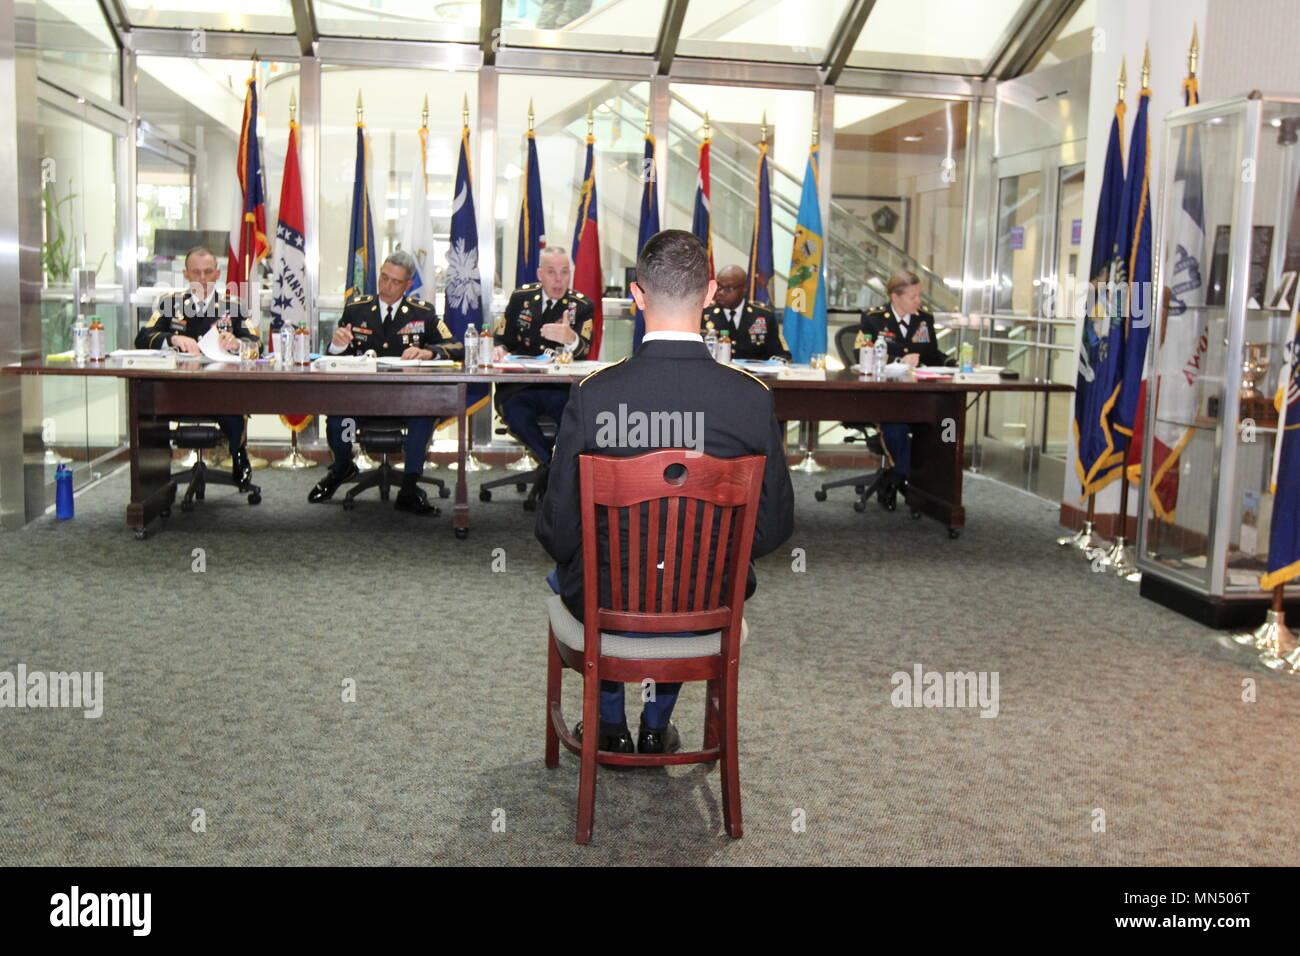 U S Army Cyber Command Stock Photos & U S Army Cyber Command